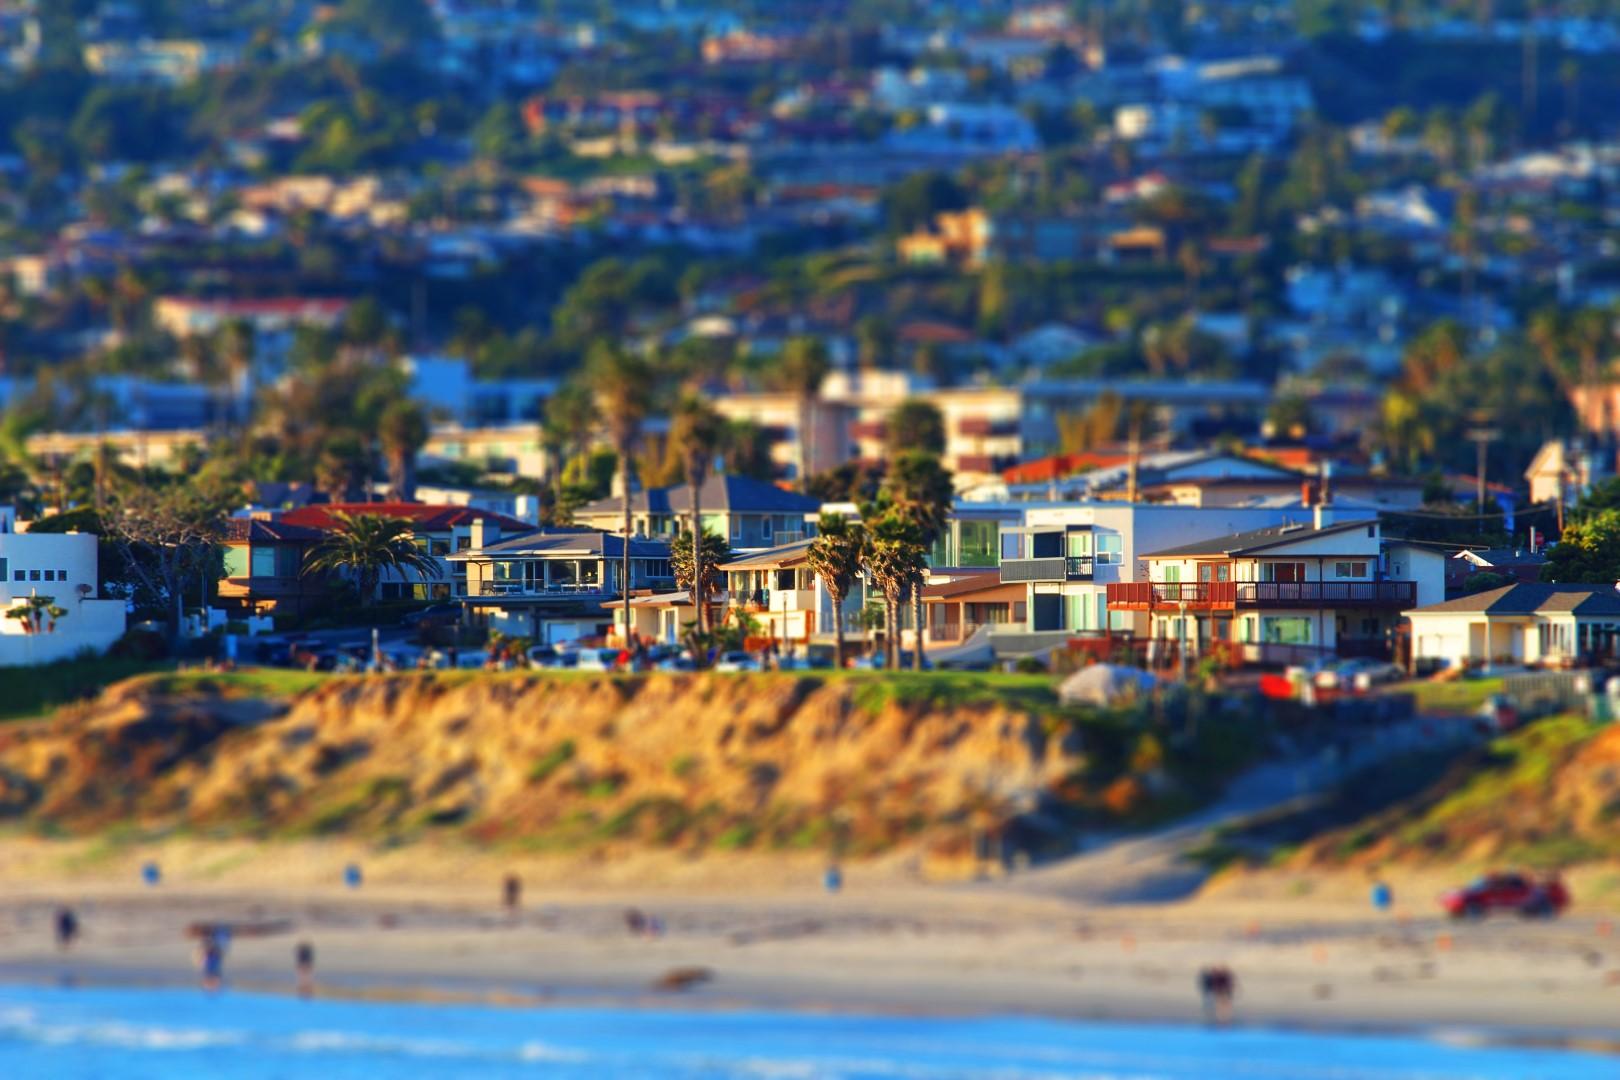 San Diego CA Miniature Effect